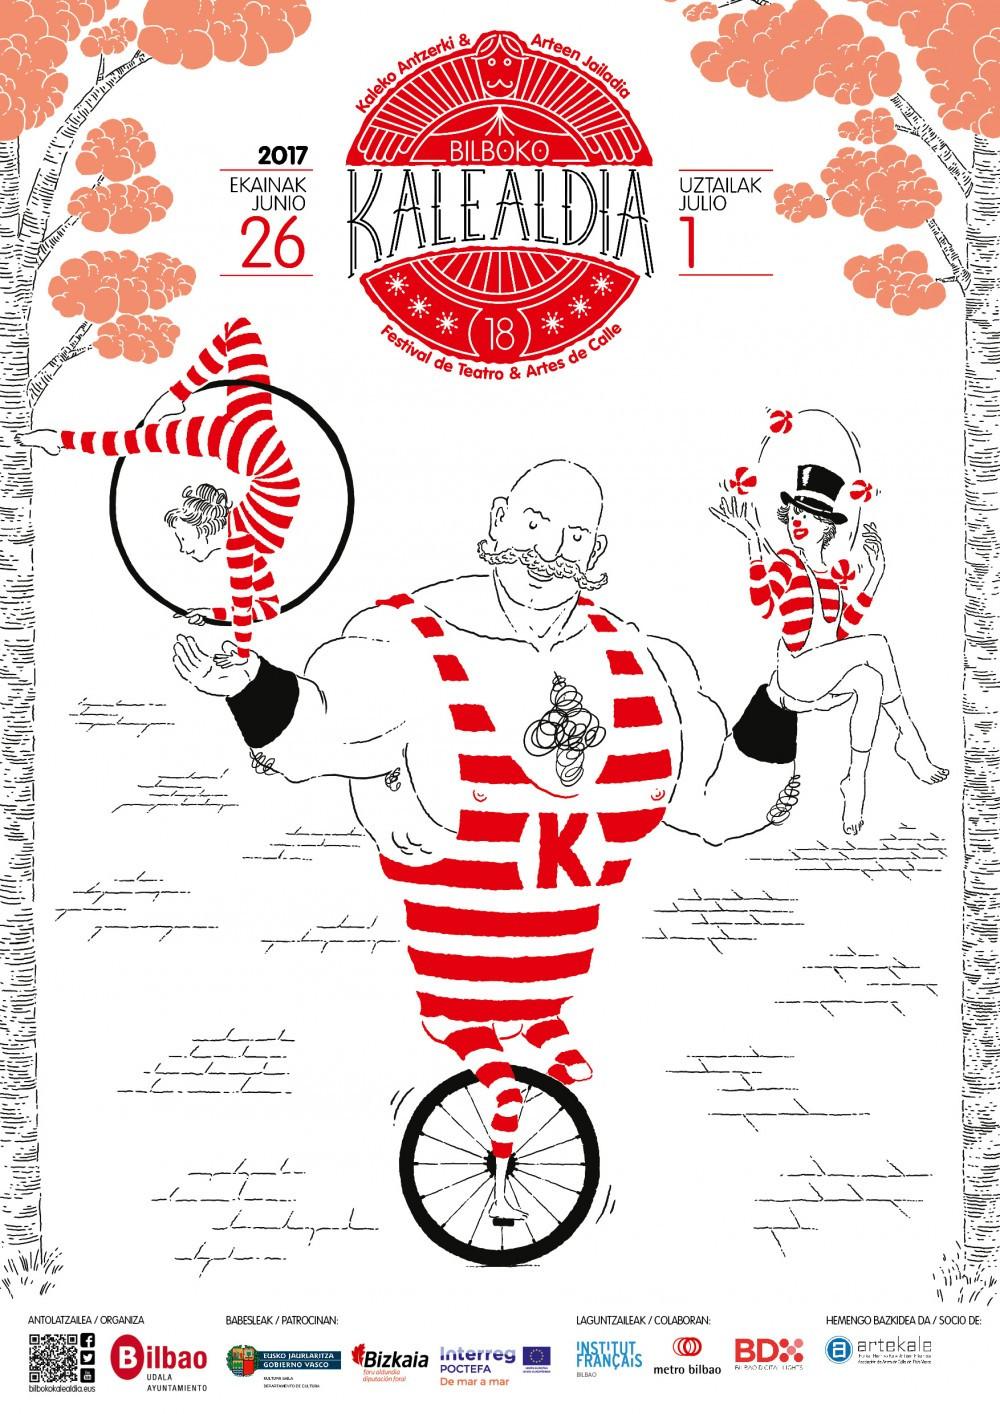 Bilboko Kalealdia 1 July 2017